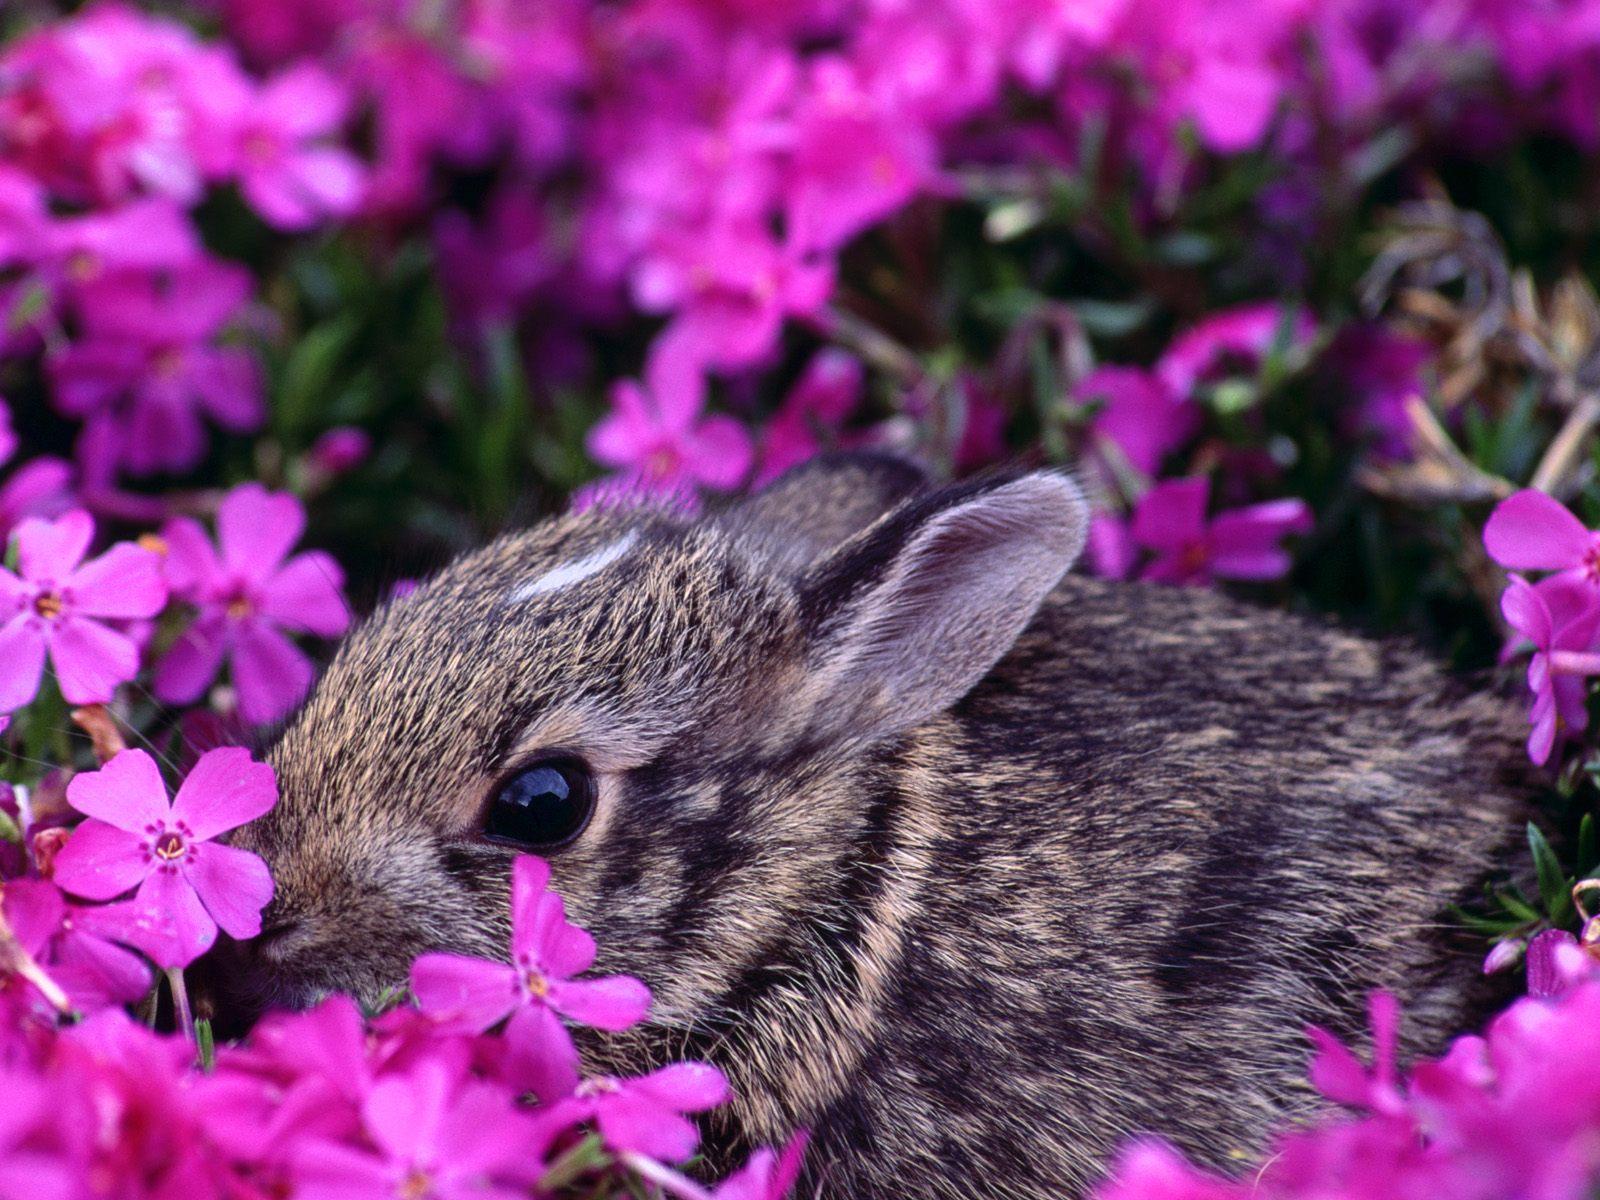 Wallpaper: Wallpaper Bunny Rabbit